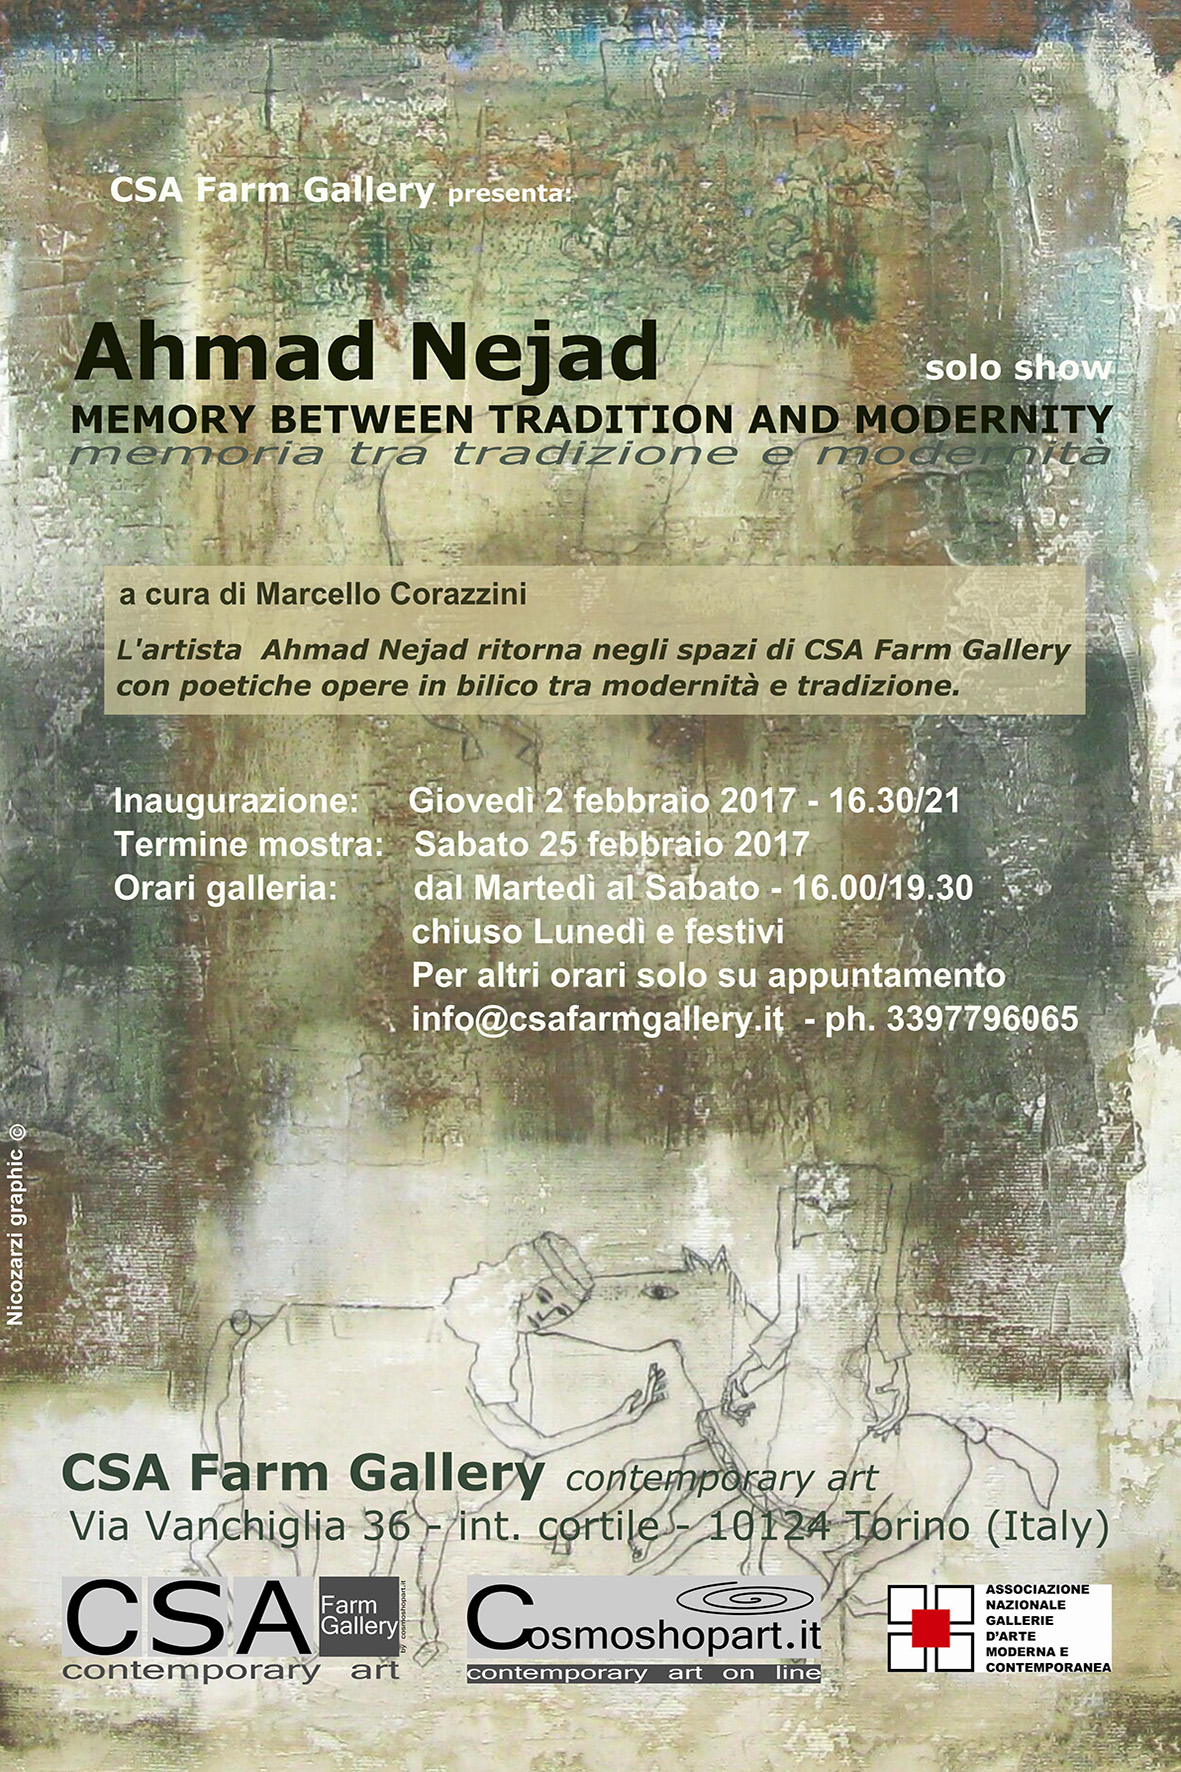 Ahmad Nejad, 'Memory between Tradition and Modernity', 2-25/2/2017 © A.Nejad/NicoZarzi/CSA